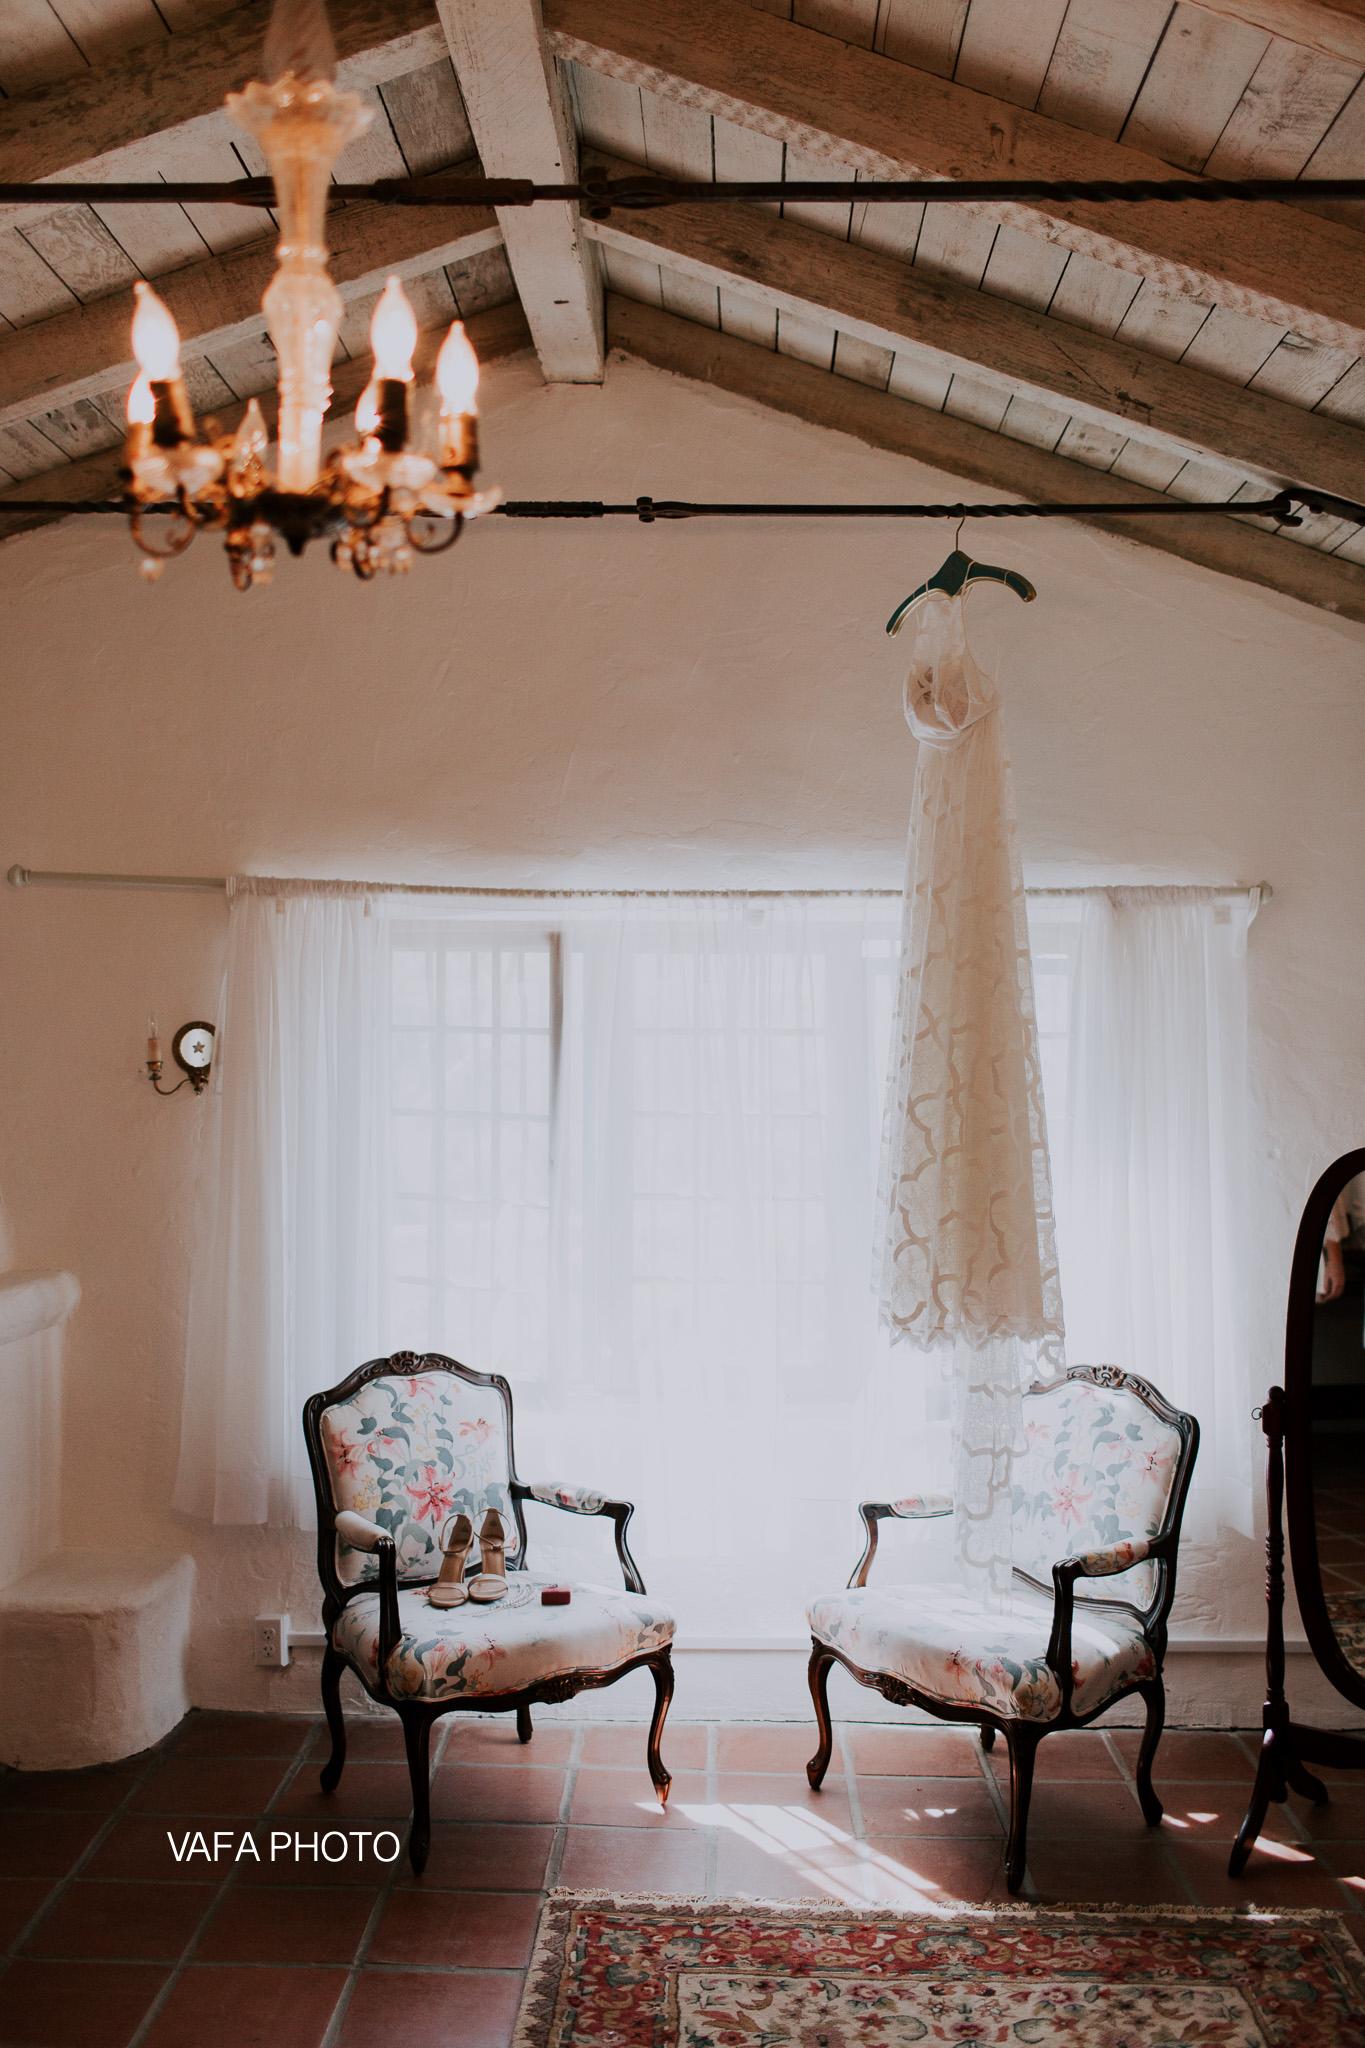 Leo-Carrillo-Ranch-Wedding-Lauren-Mike-Vafa-Photo-108.jpg